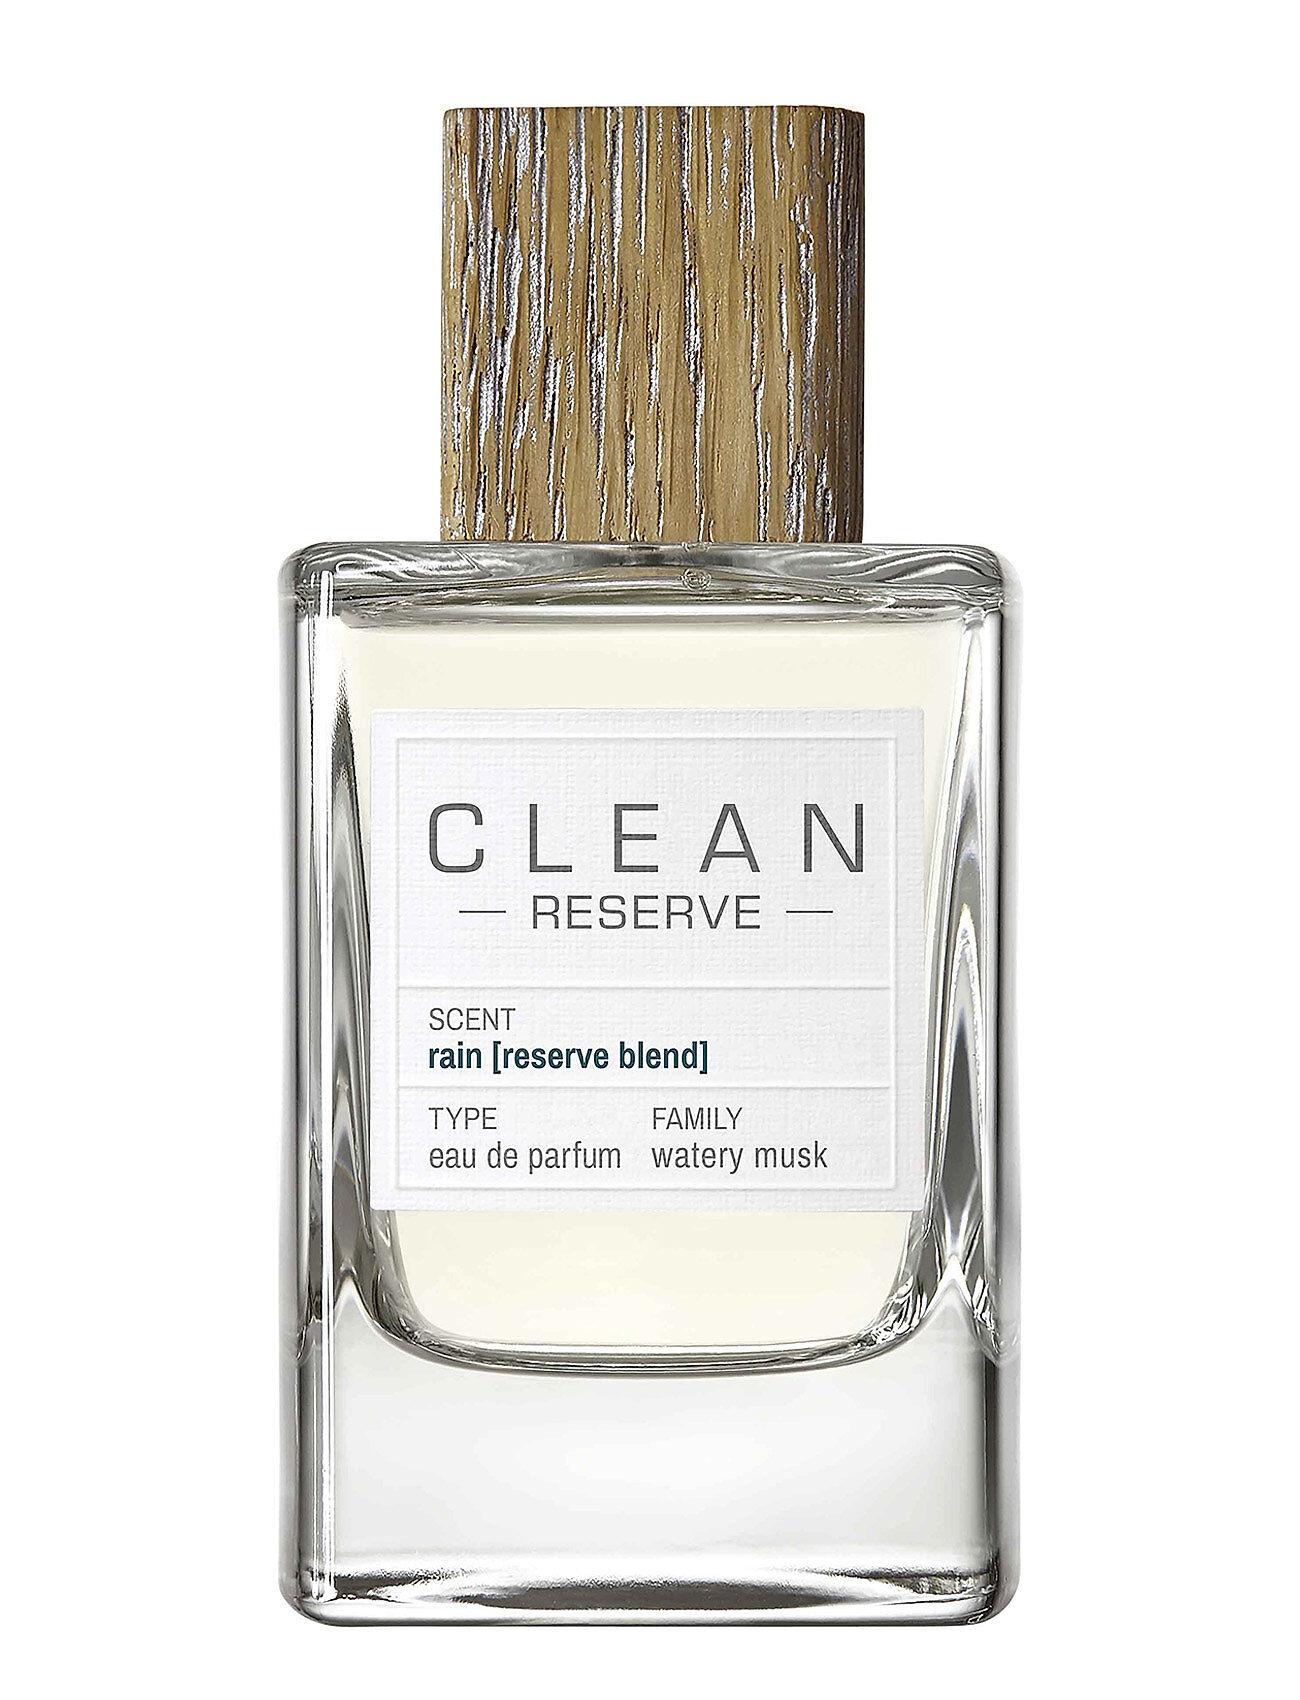 Clean Reserve Blends Rain